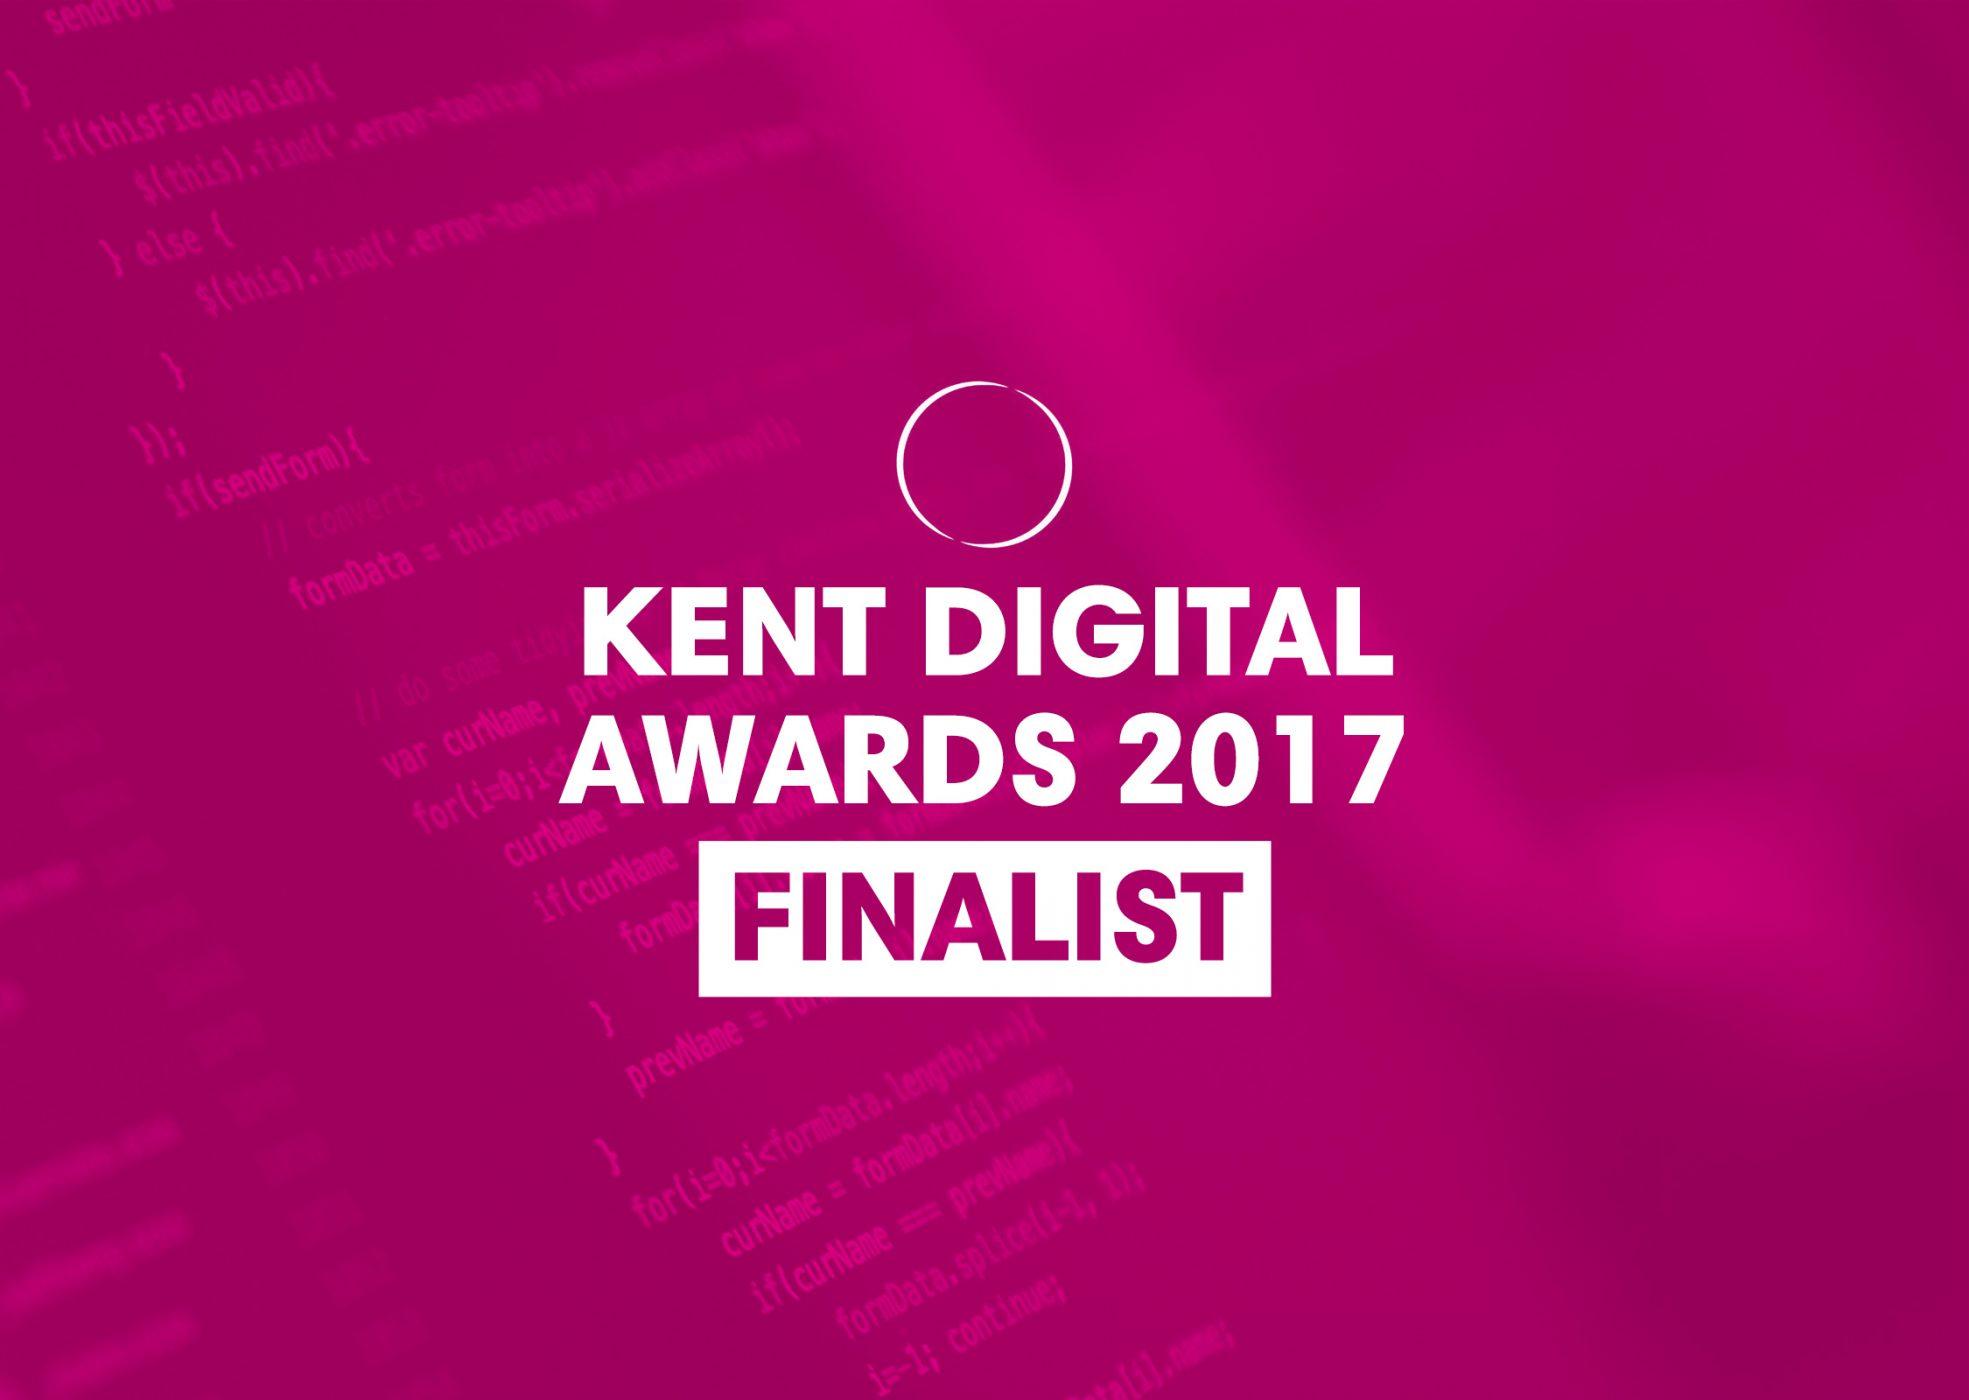 Kent Digital Awards 2017 Finalist